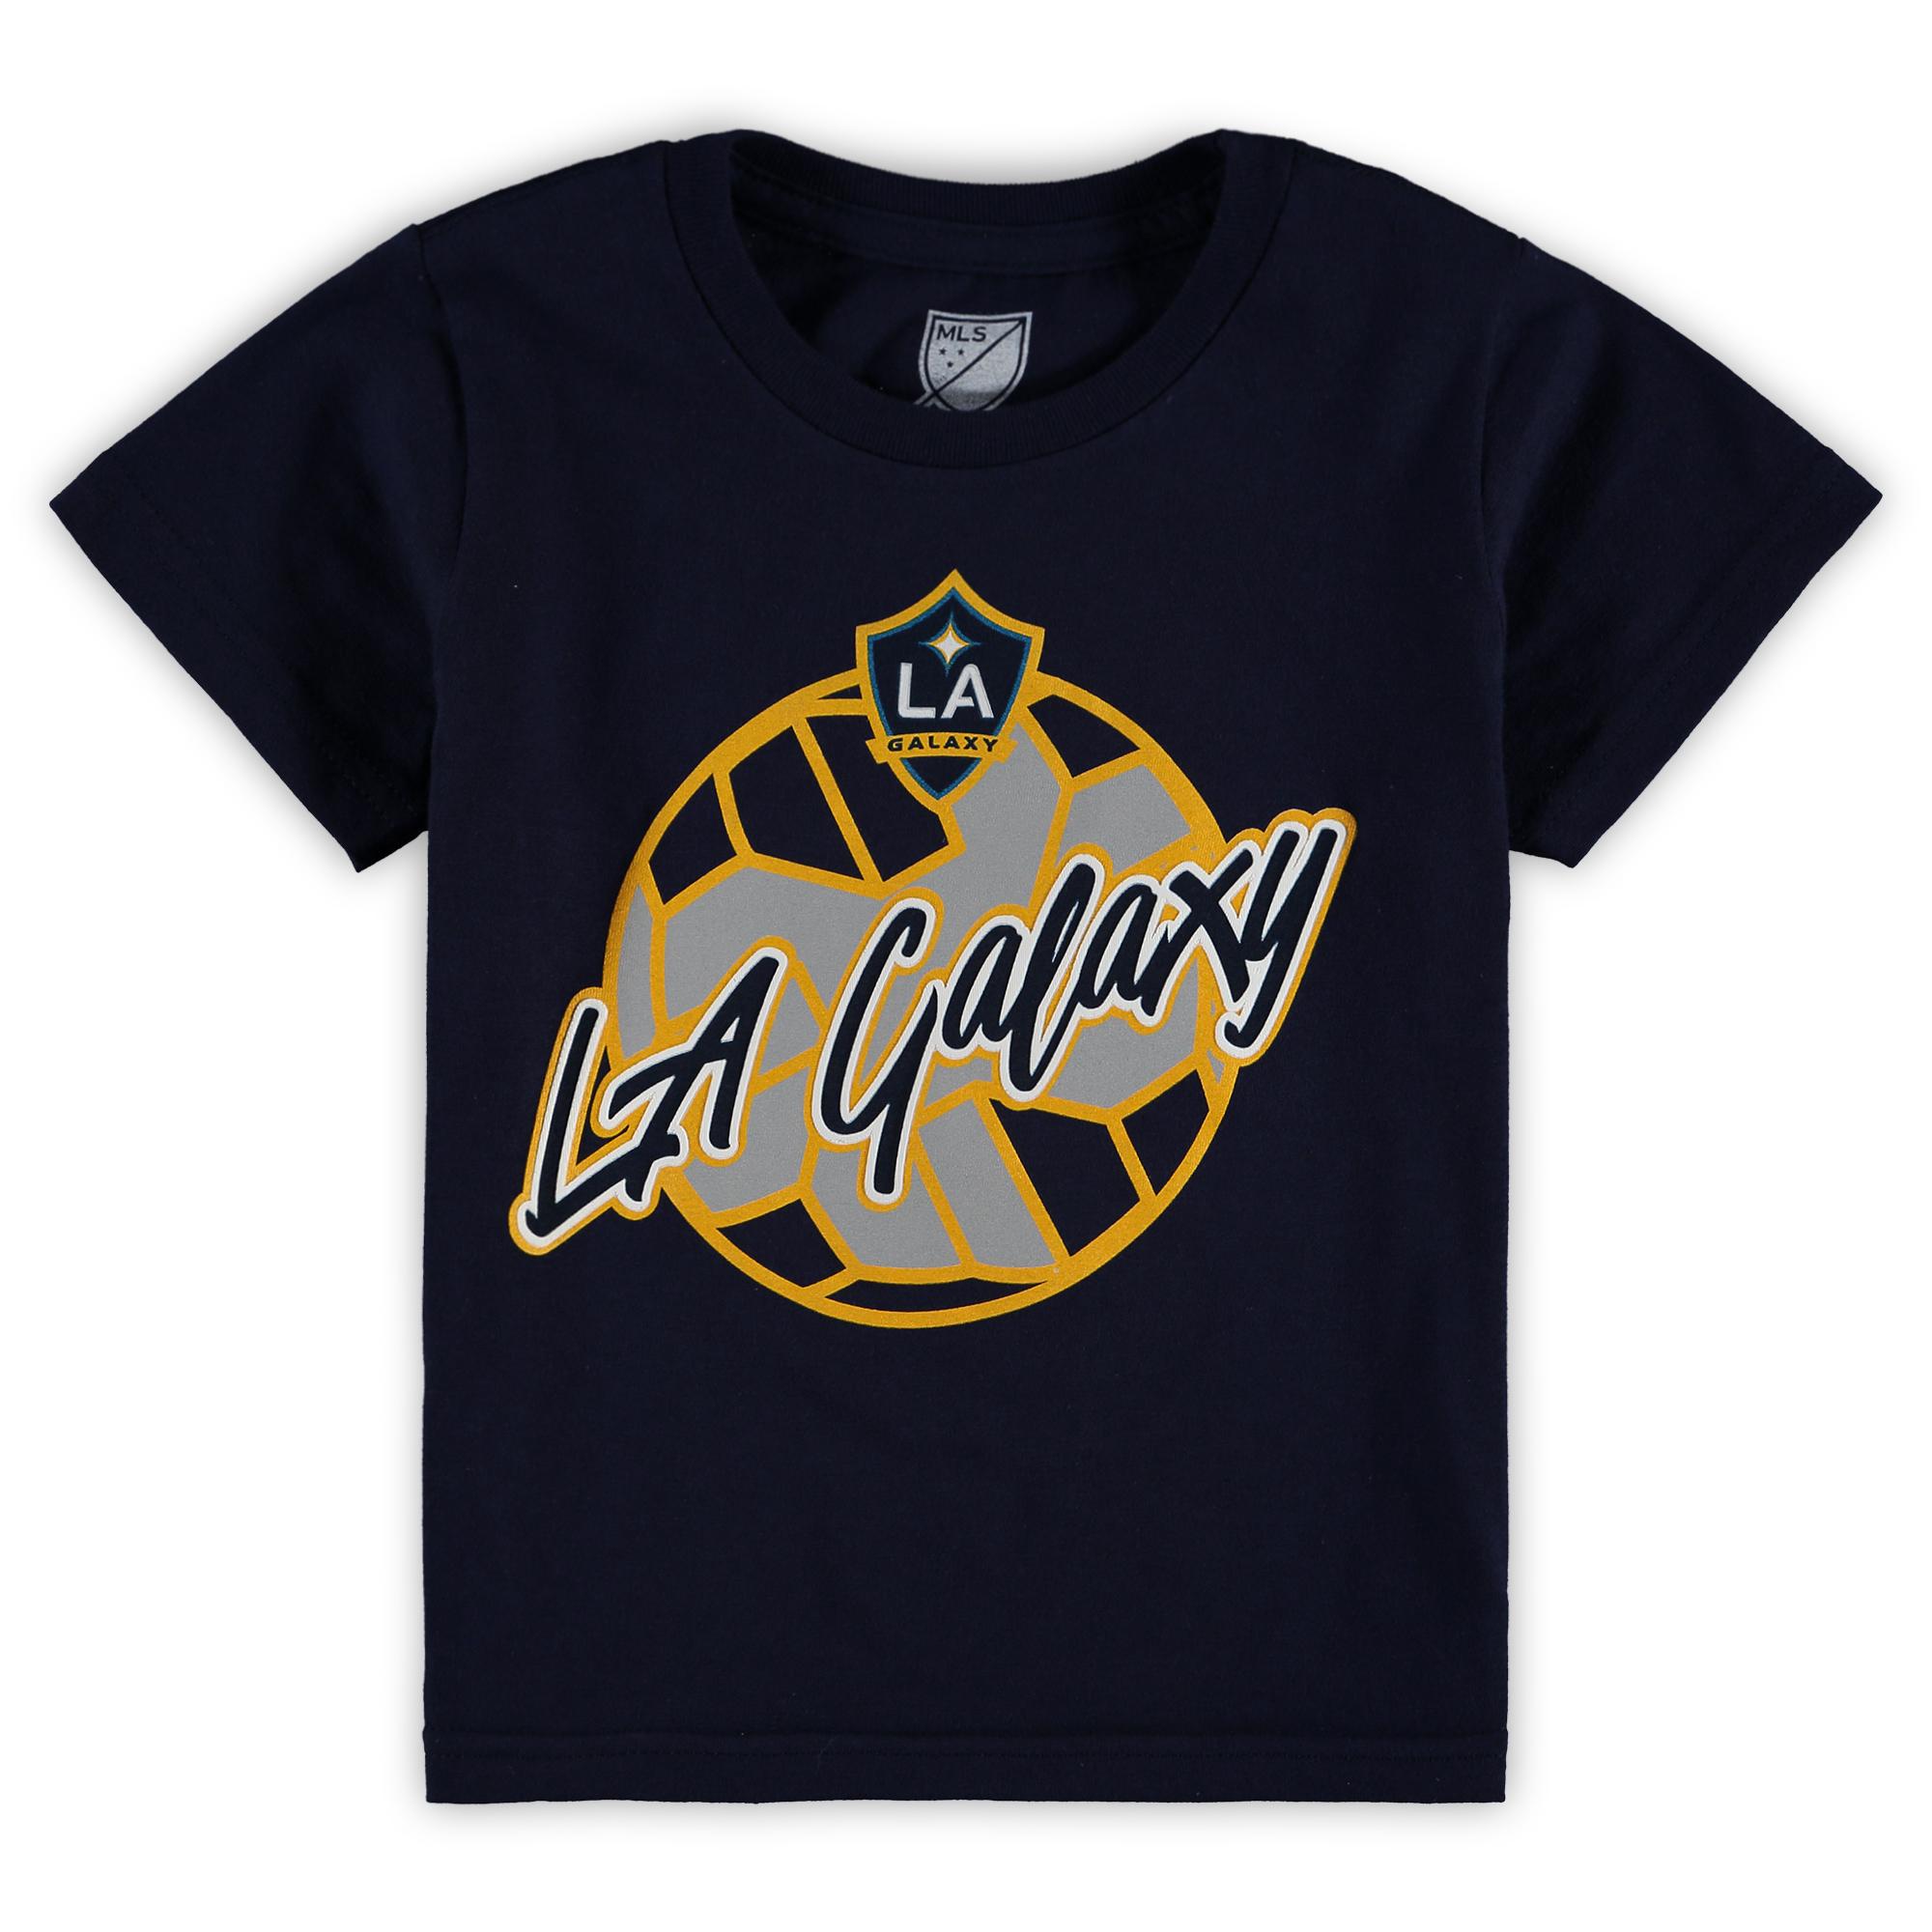 LA Galaxy Toddler Playtime T-Shirt - Navy